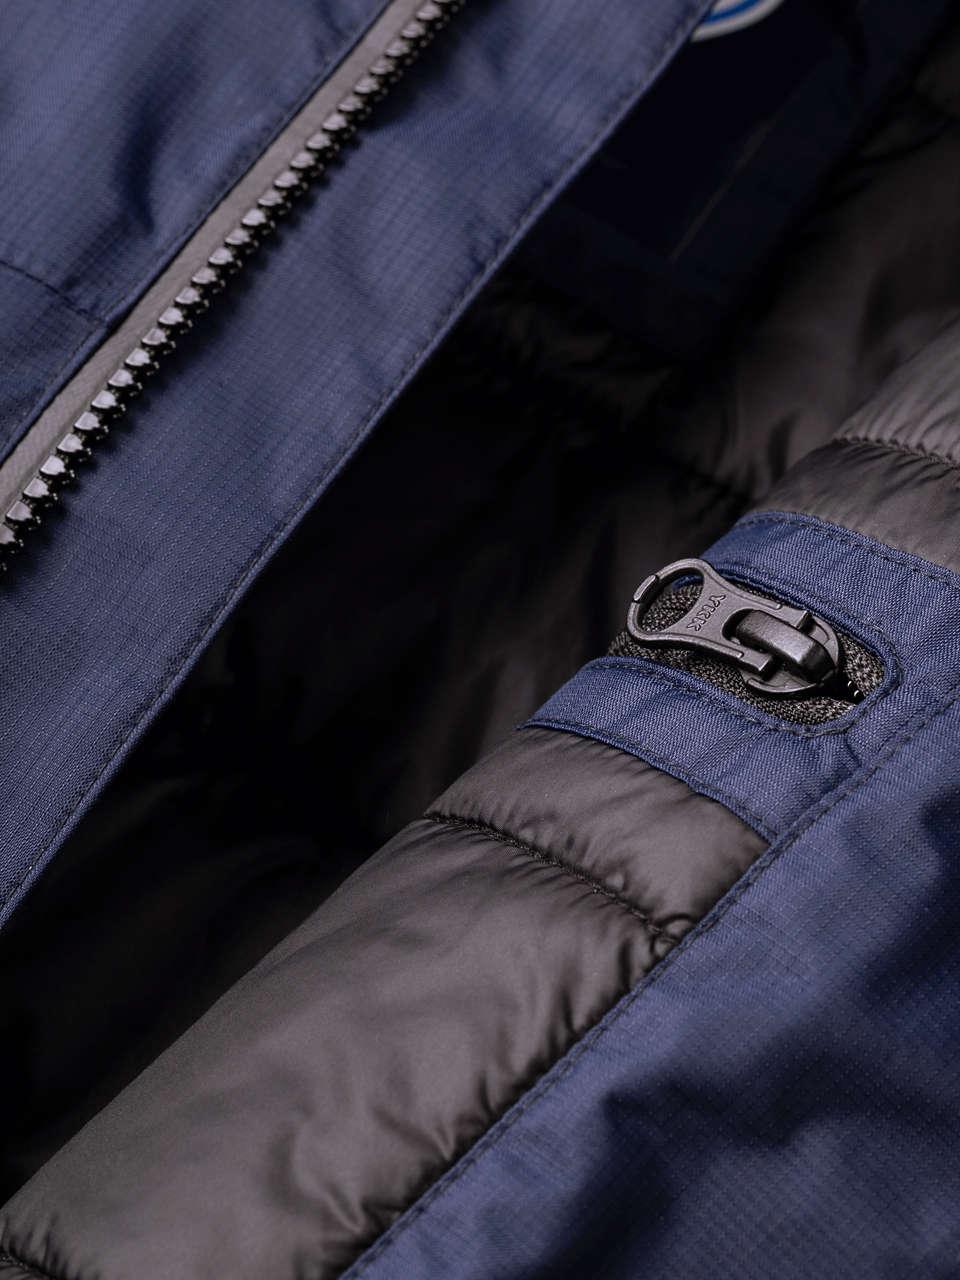 NSX Pro Fastnet Jacket